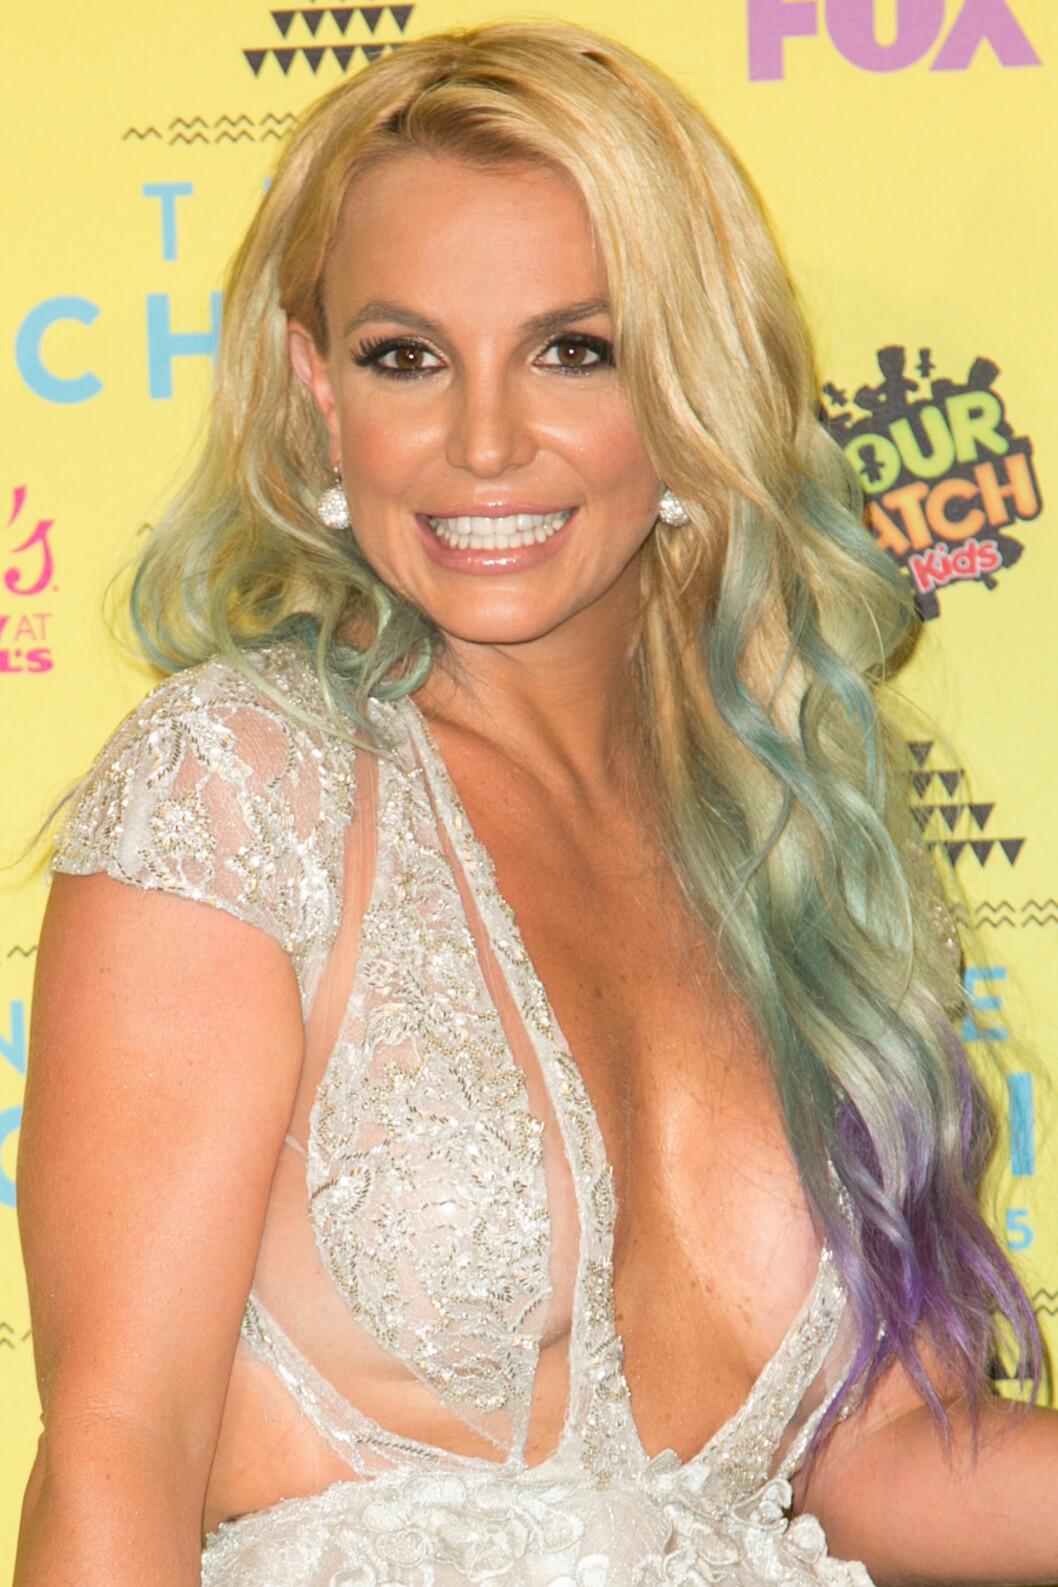 <strong>2015:</strong> Britney stiller med fargerikt hår under Teen Choice Awards. Foto: wenn.com